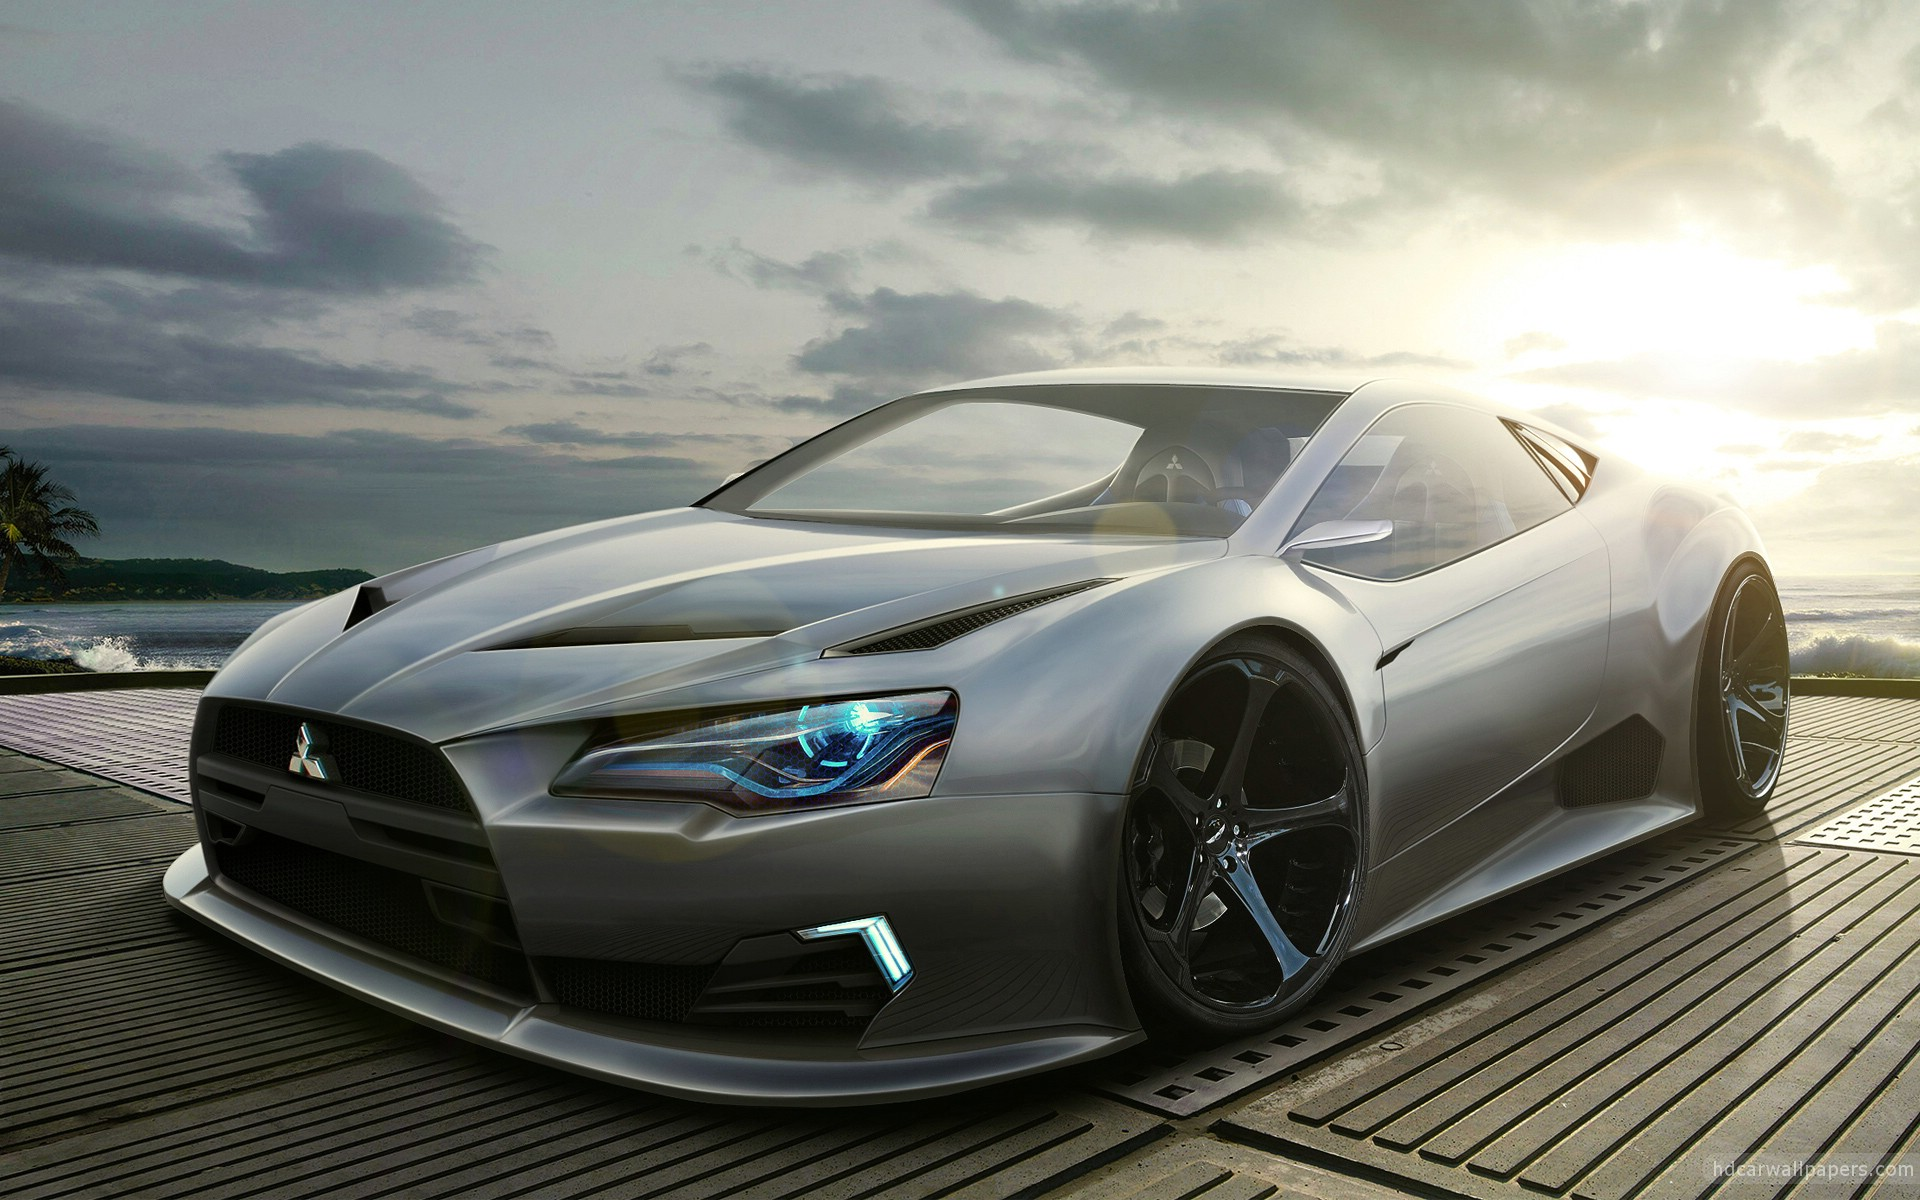 Hd wallpaper cars - Hd Wallpapers 1080p Cars Wallpaper Wallpaper Hd Background Desktop